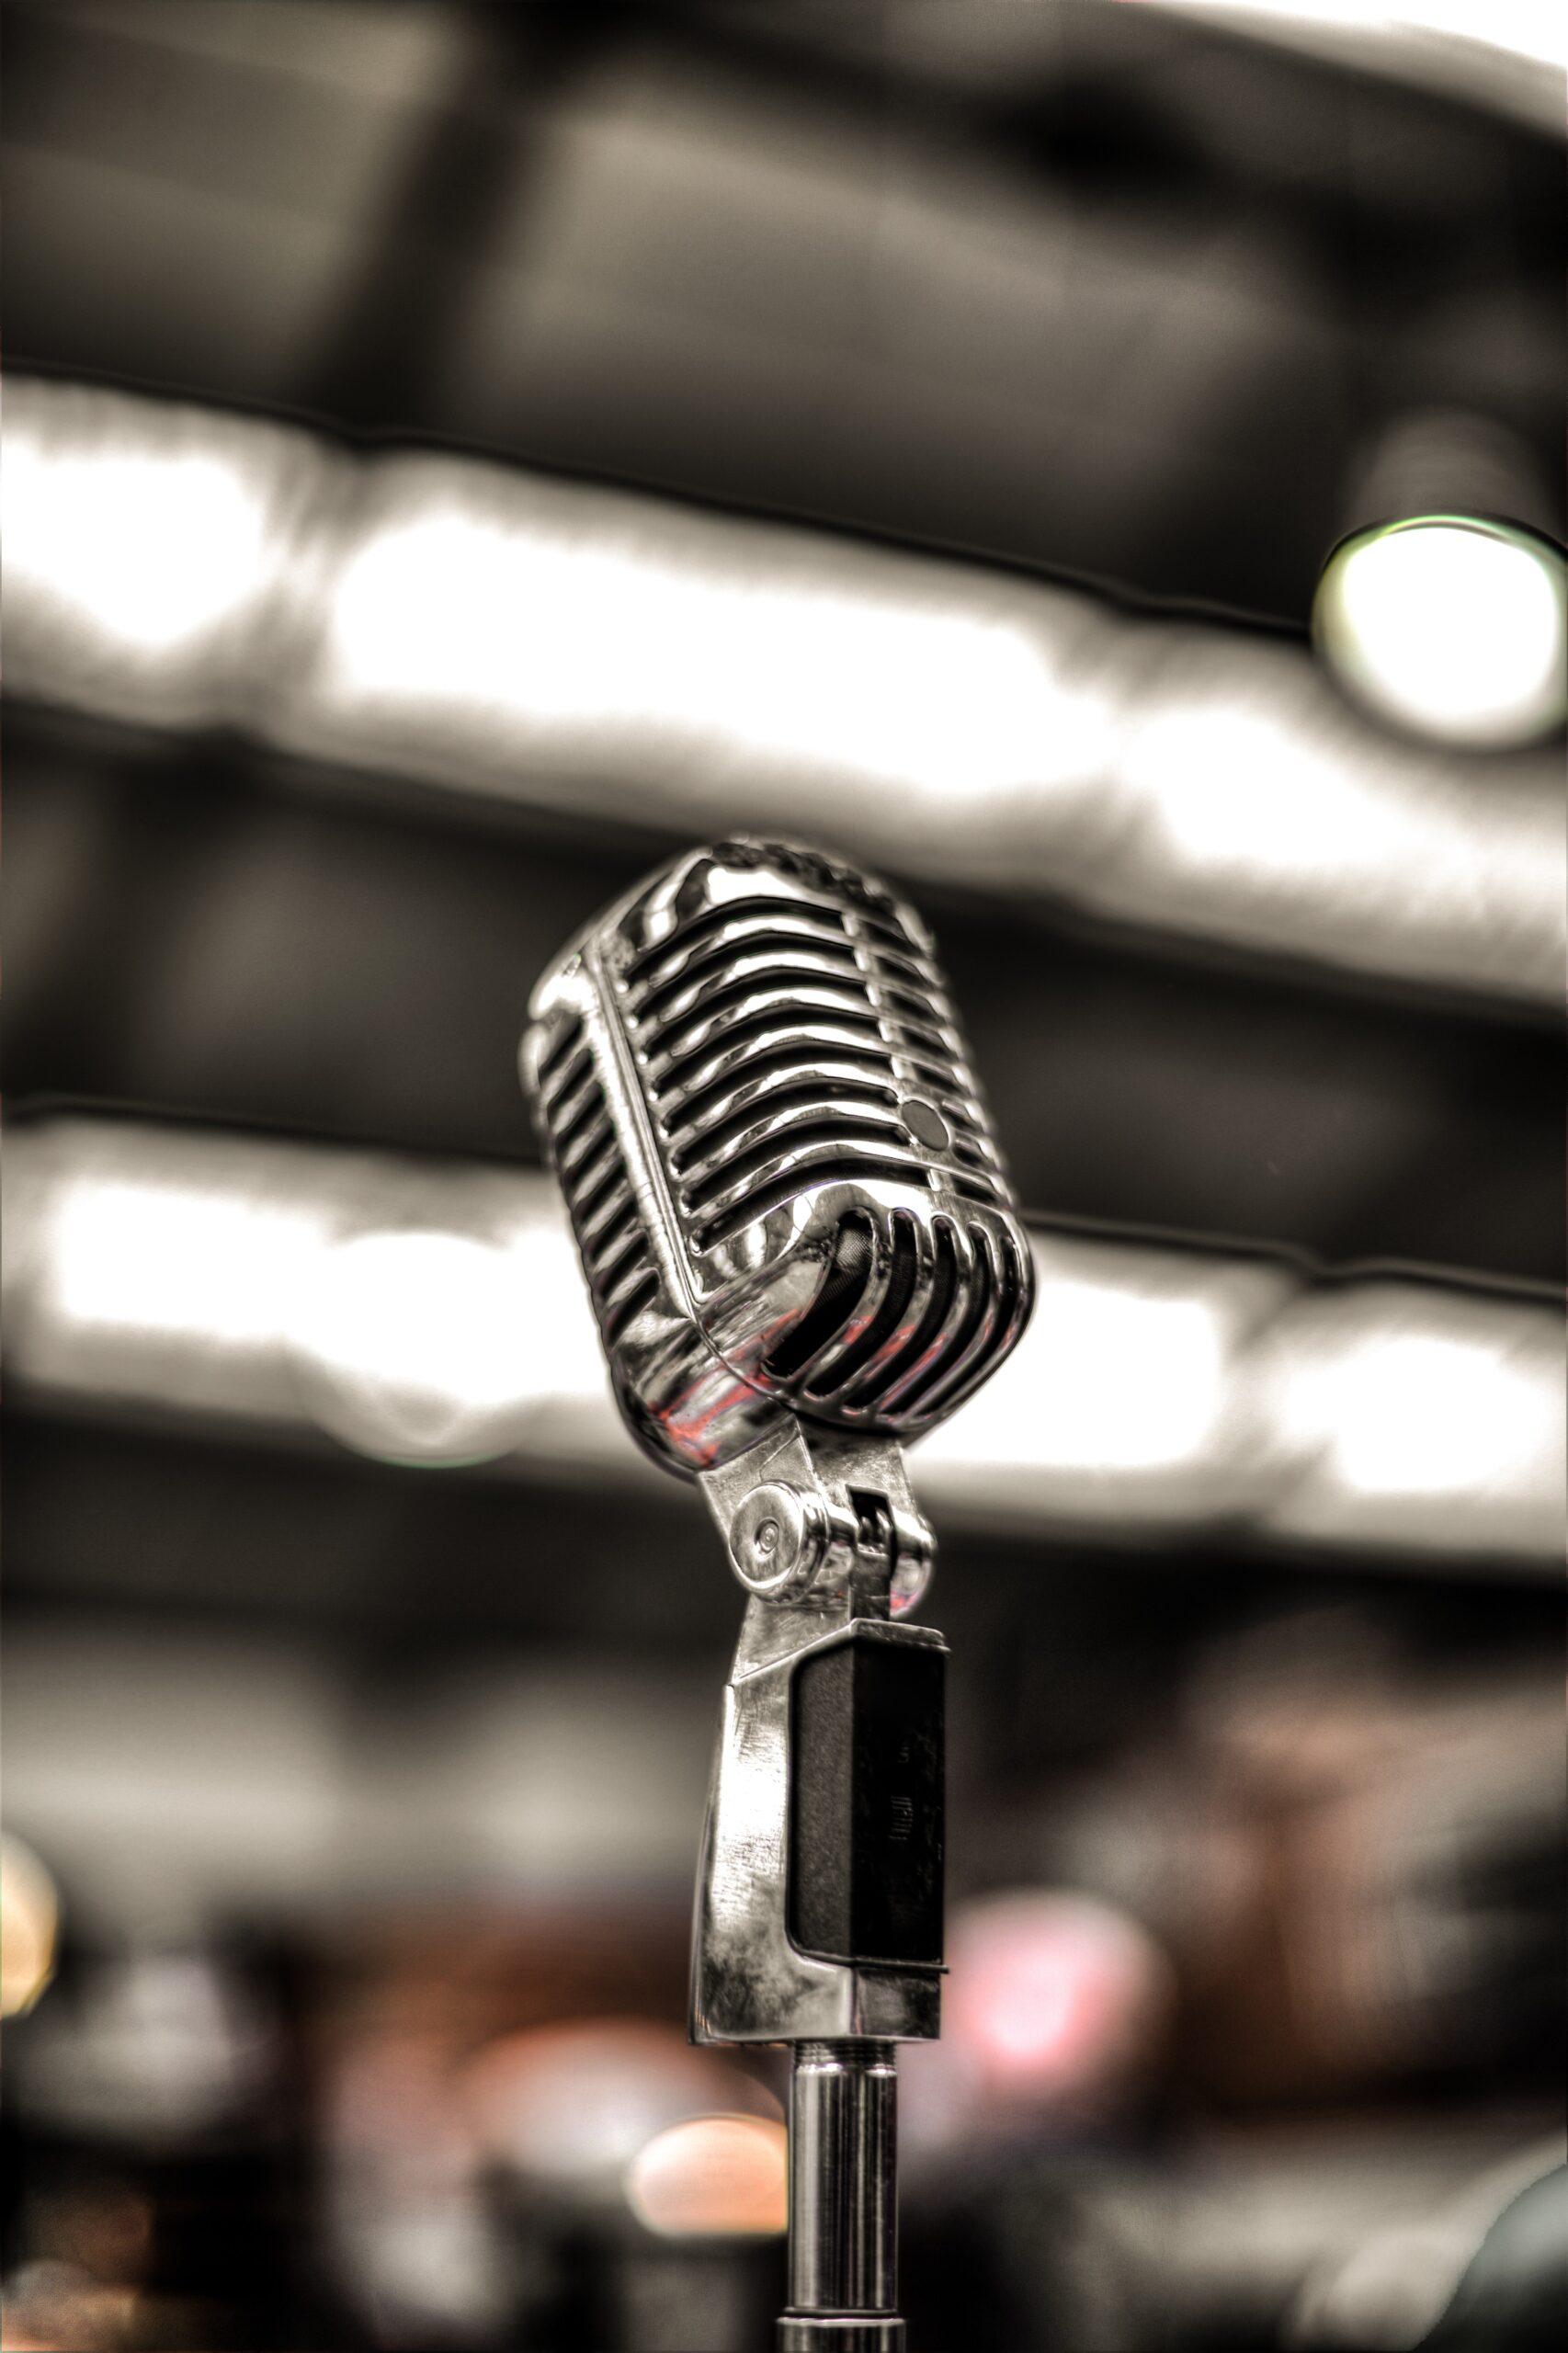 Microphone - Rachel Writes press release writing service